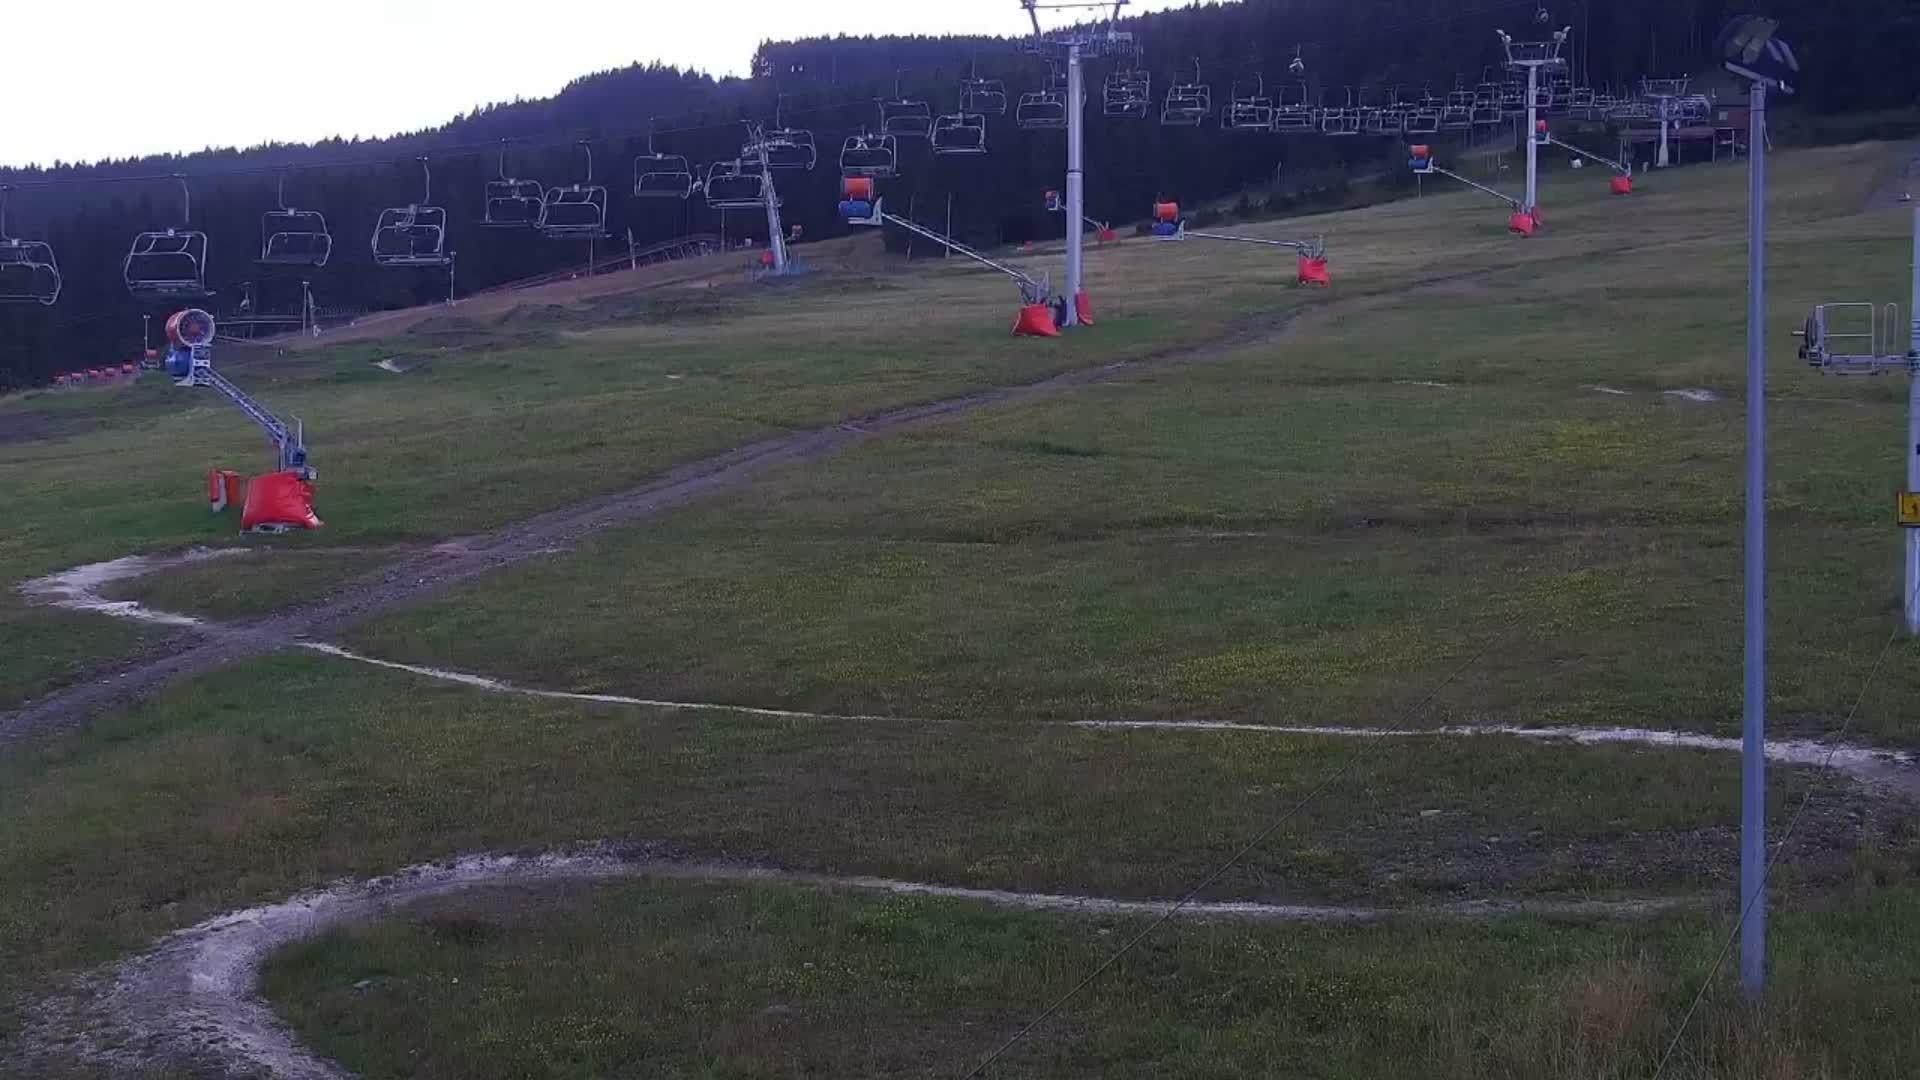 Webcam Ski Resort Czarna Gora cam 4 - Snieznik Mountains